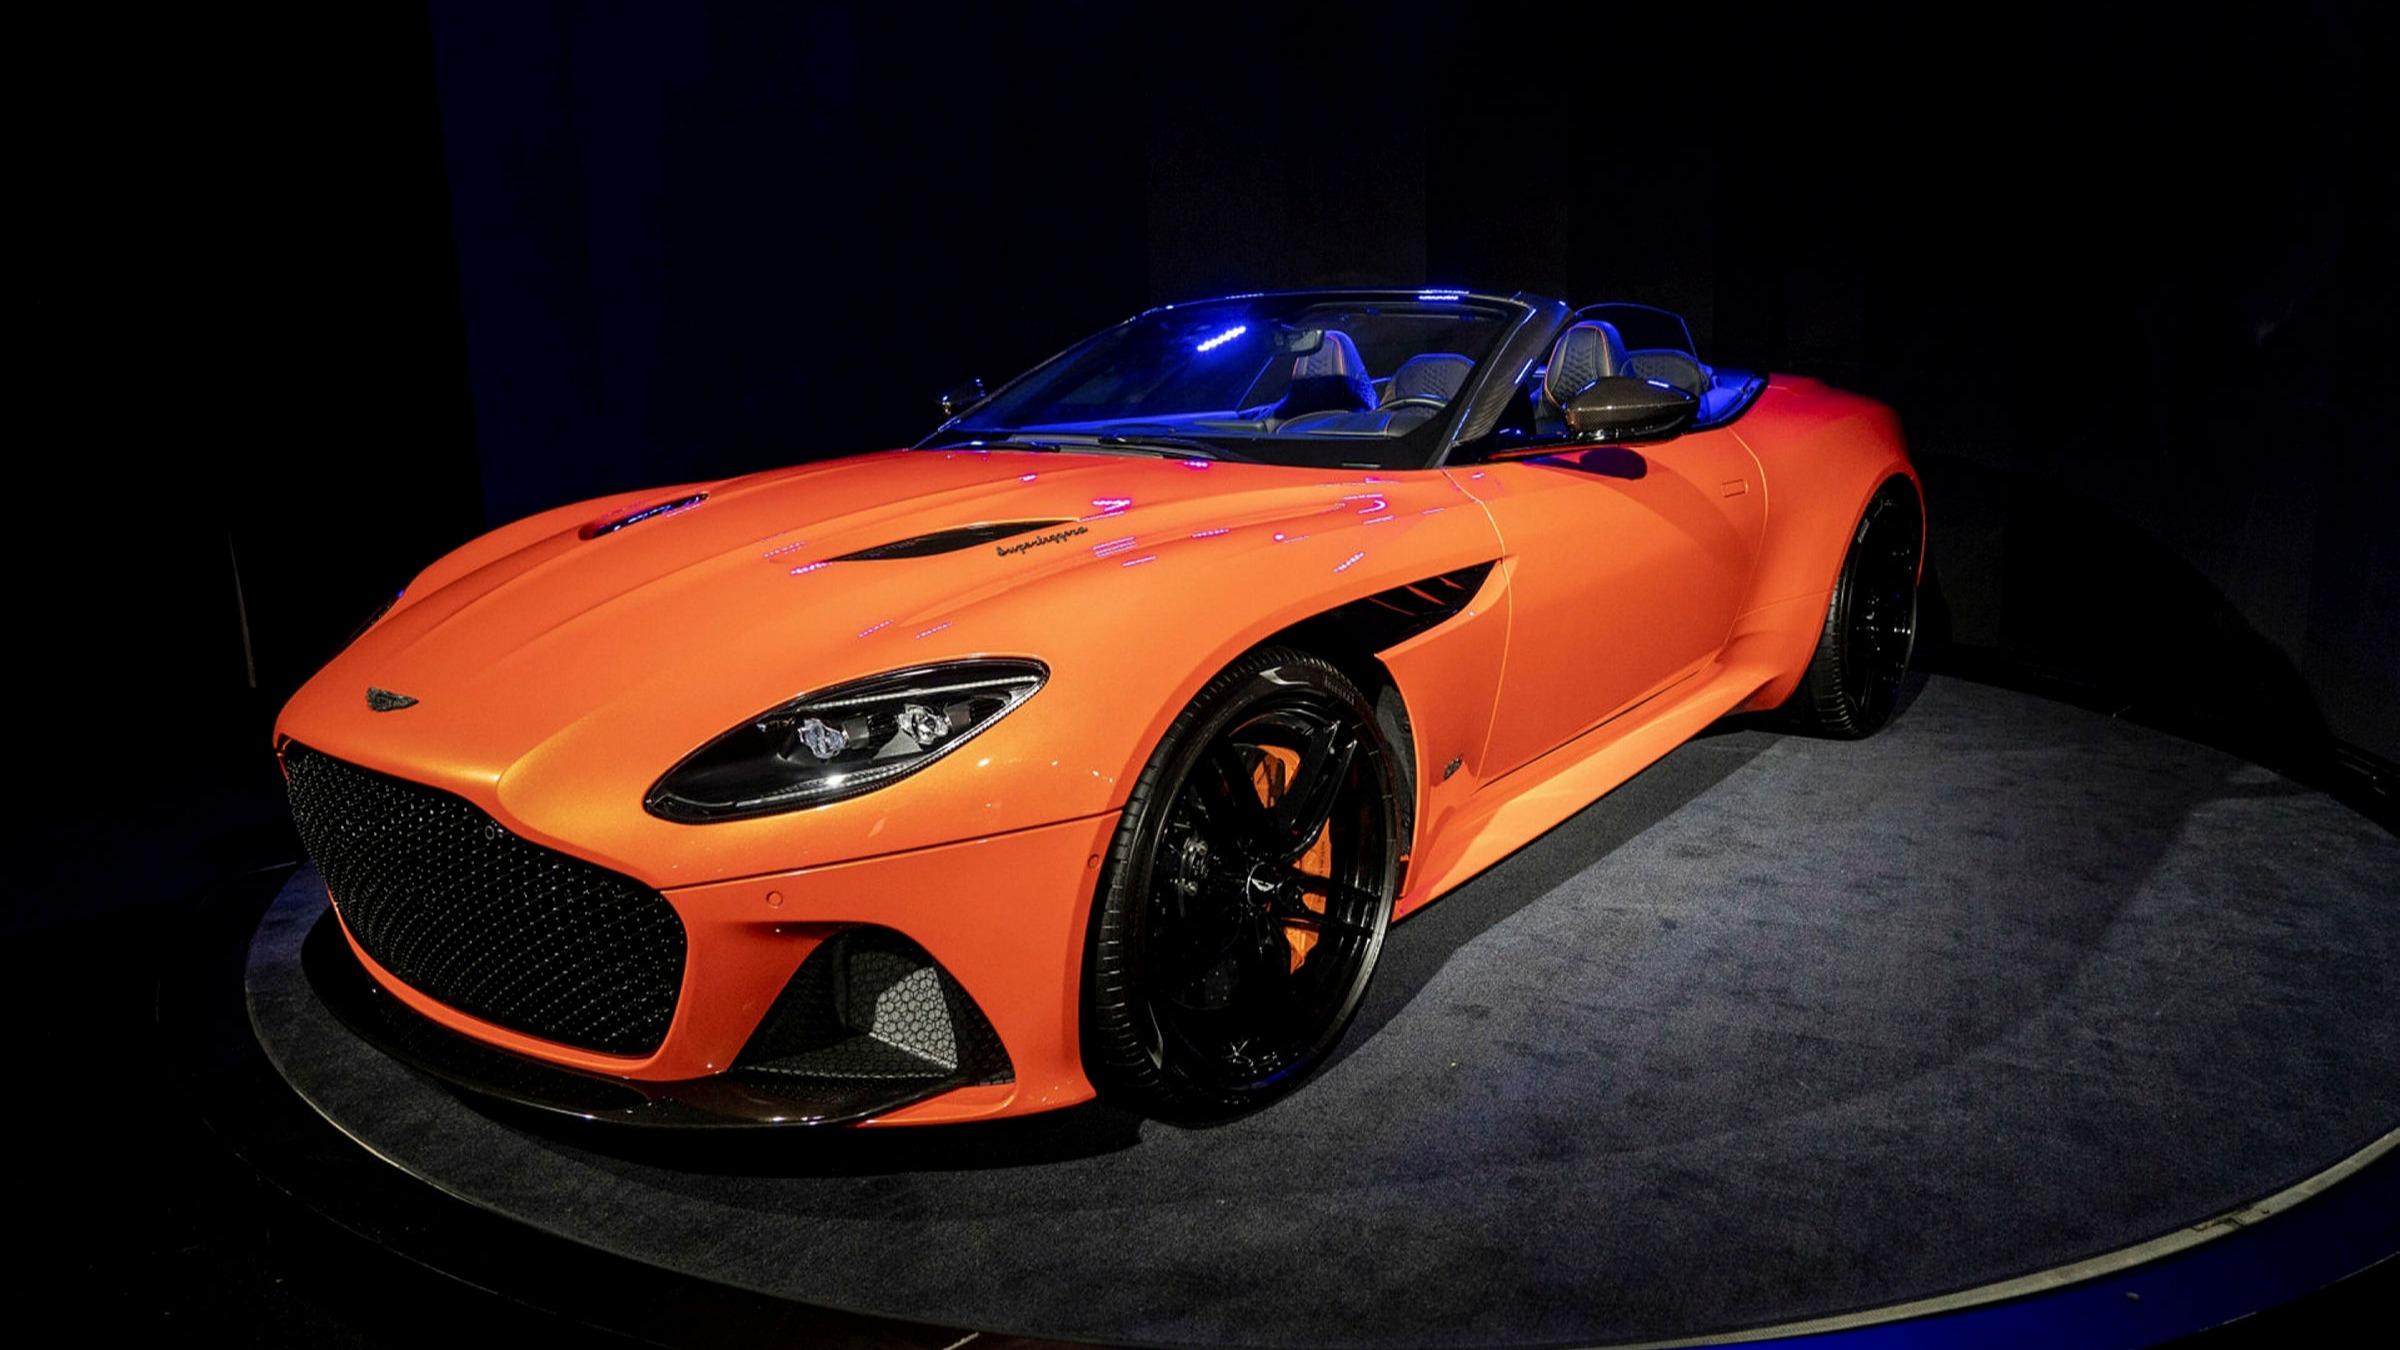 Daimler To Increase Stake In Aston Martin To 20 Financial Times